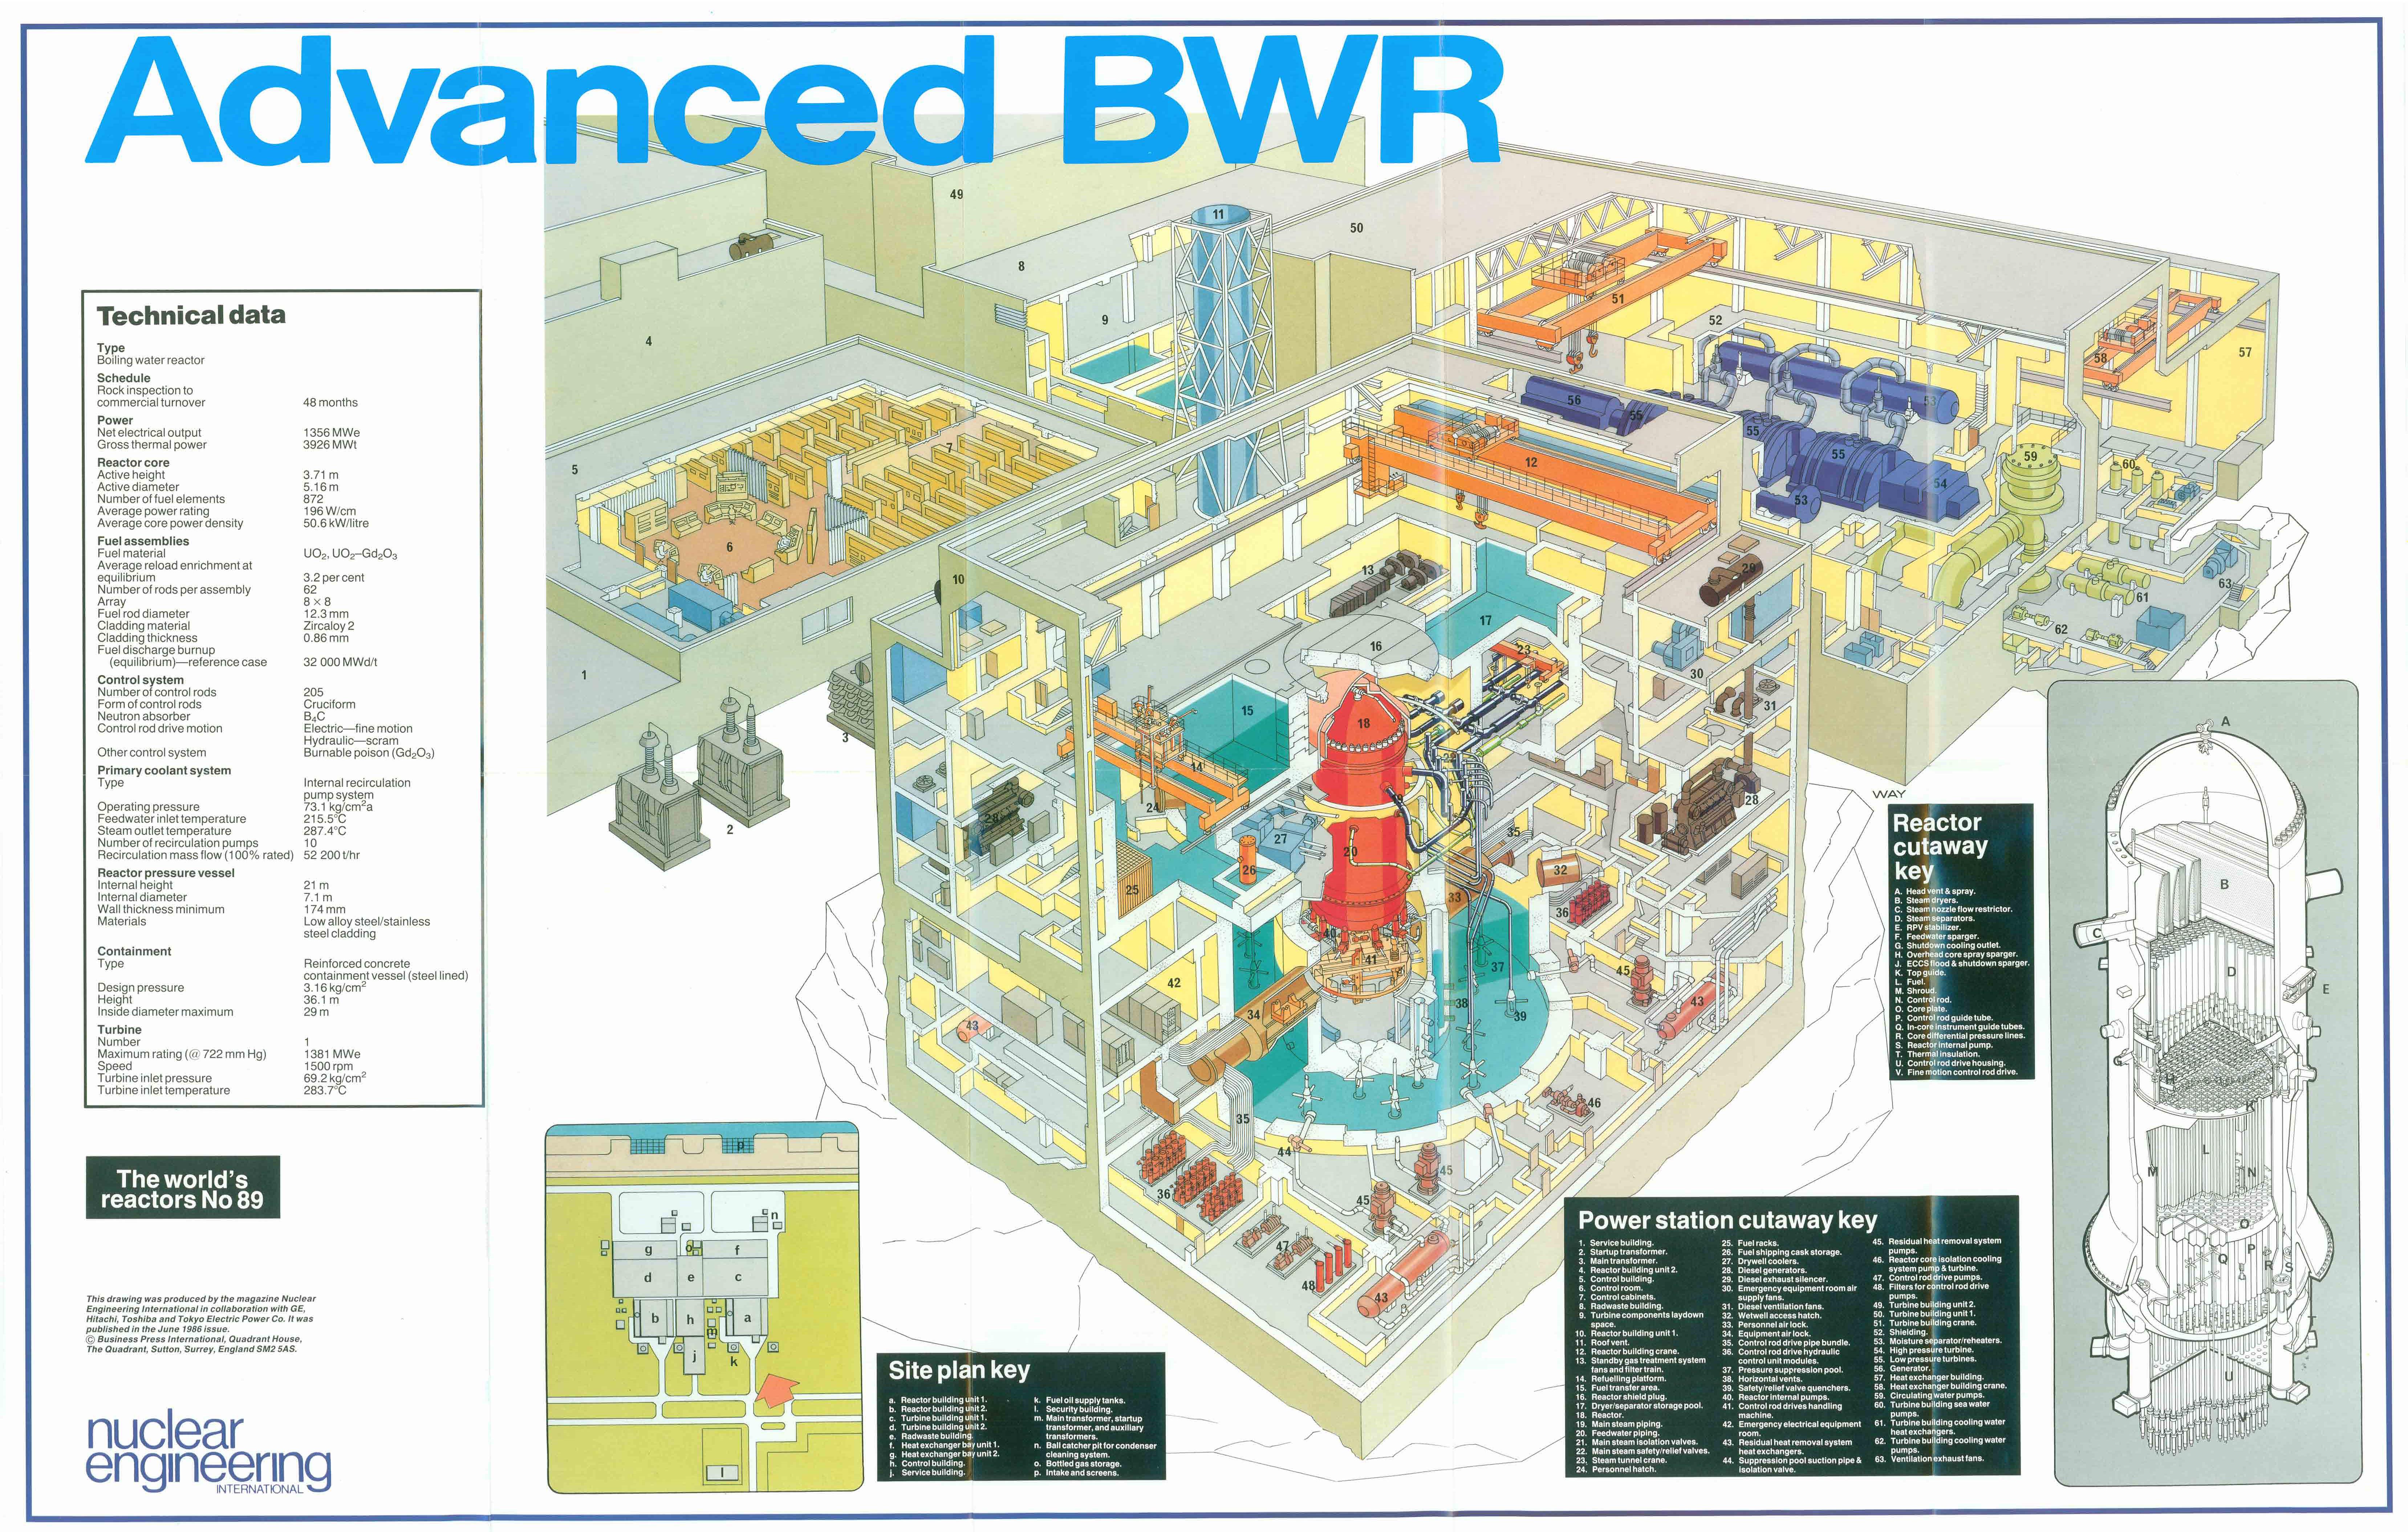 Fukushima Daiichi nuclear saga – 2 to 9 April overview